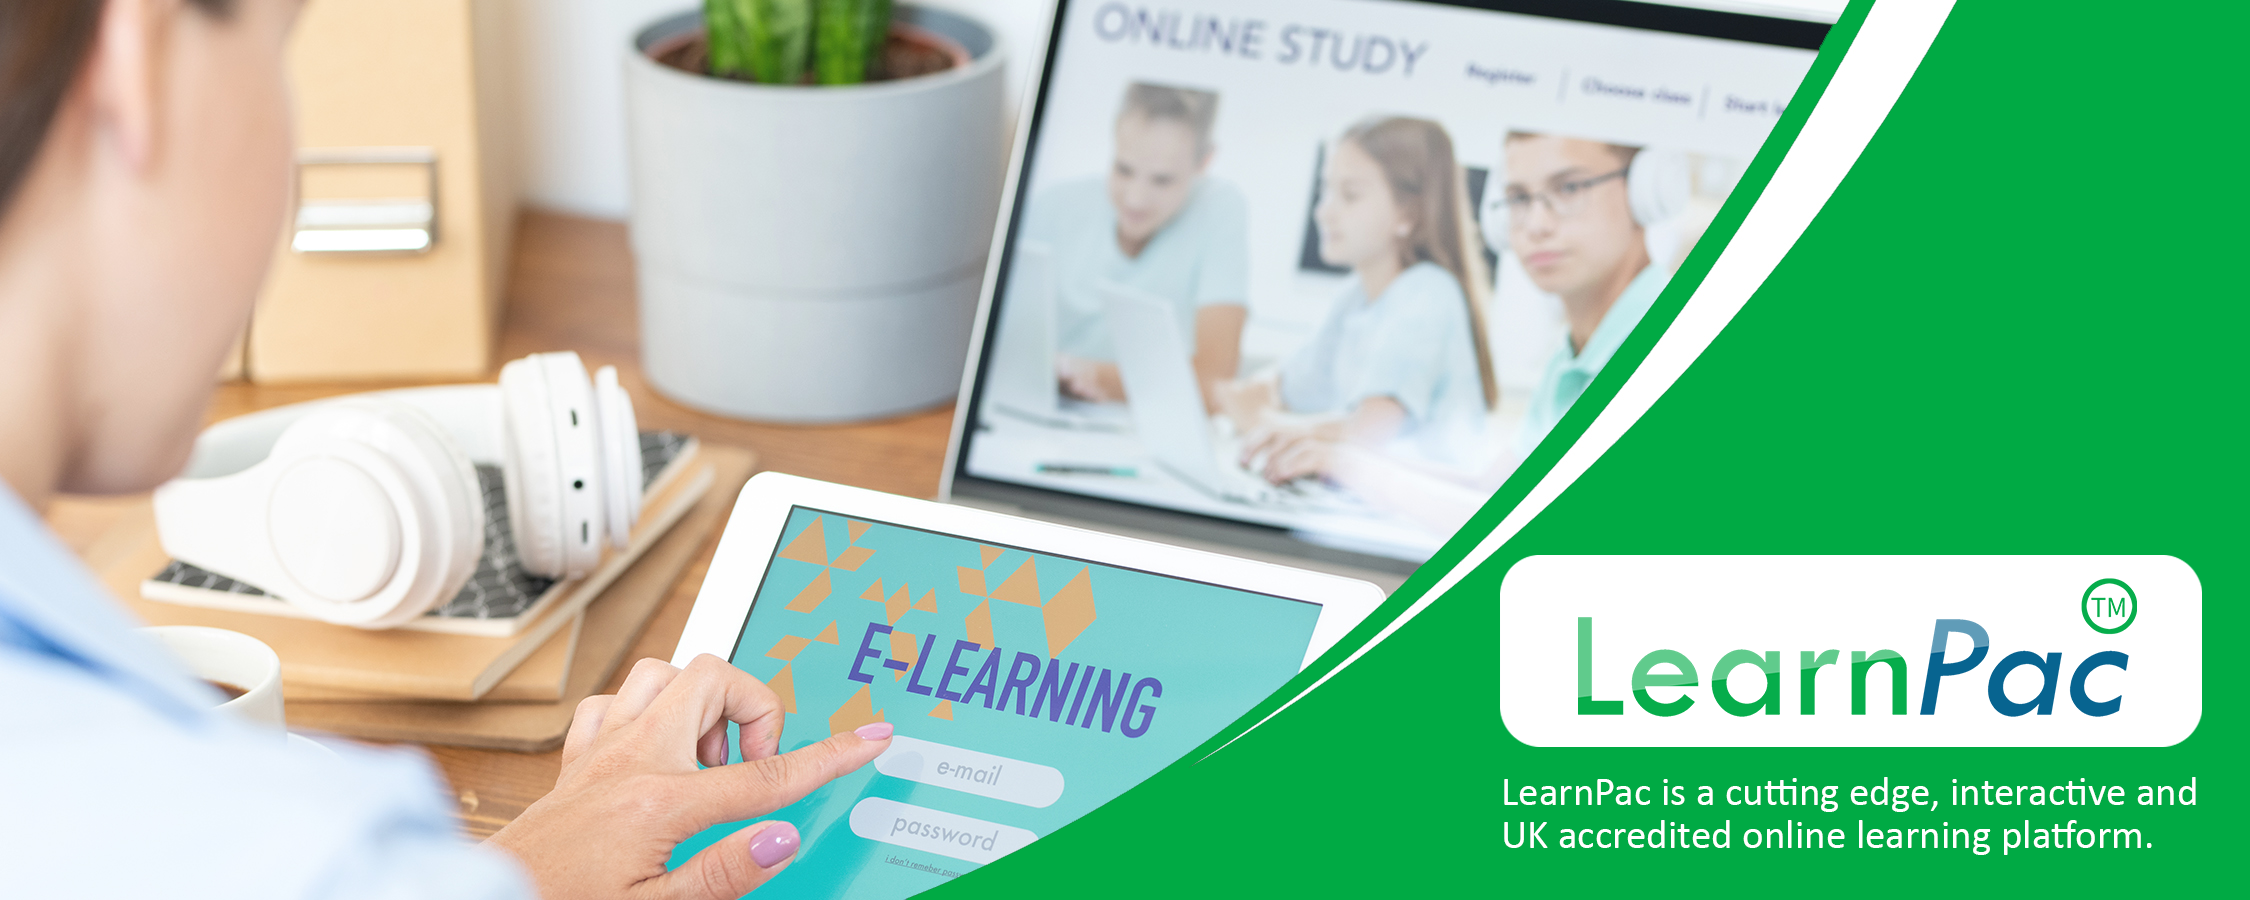 Epilepsy Awareness Training - Online Learning Courses - E-Learning Courses - LearnPac Systems UK -